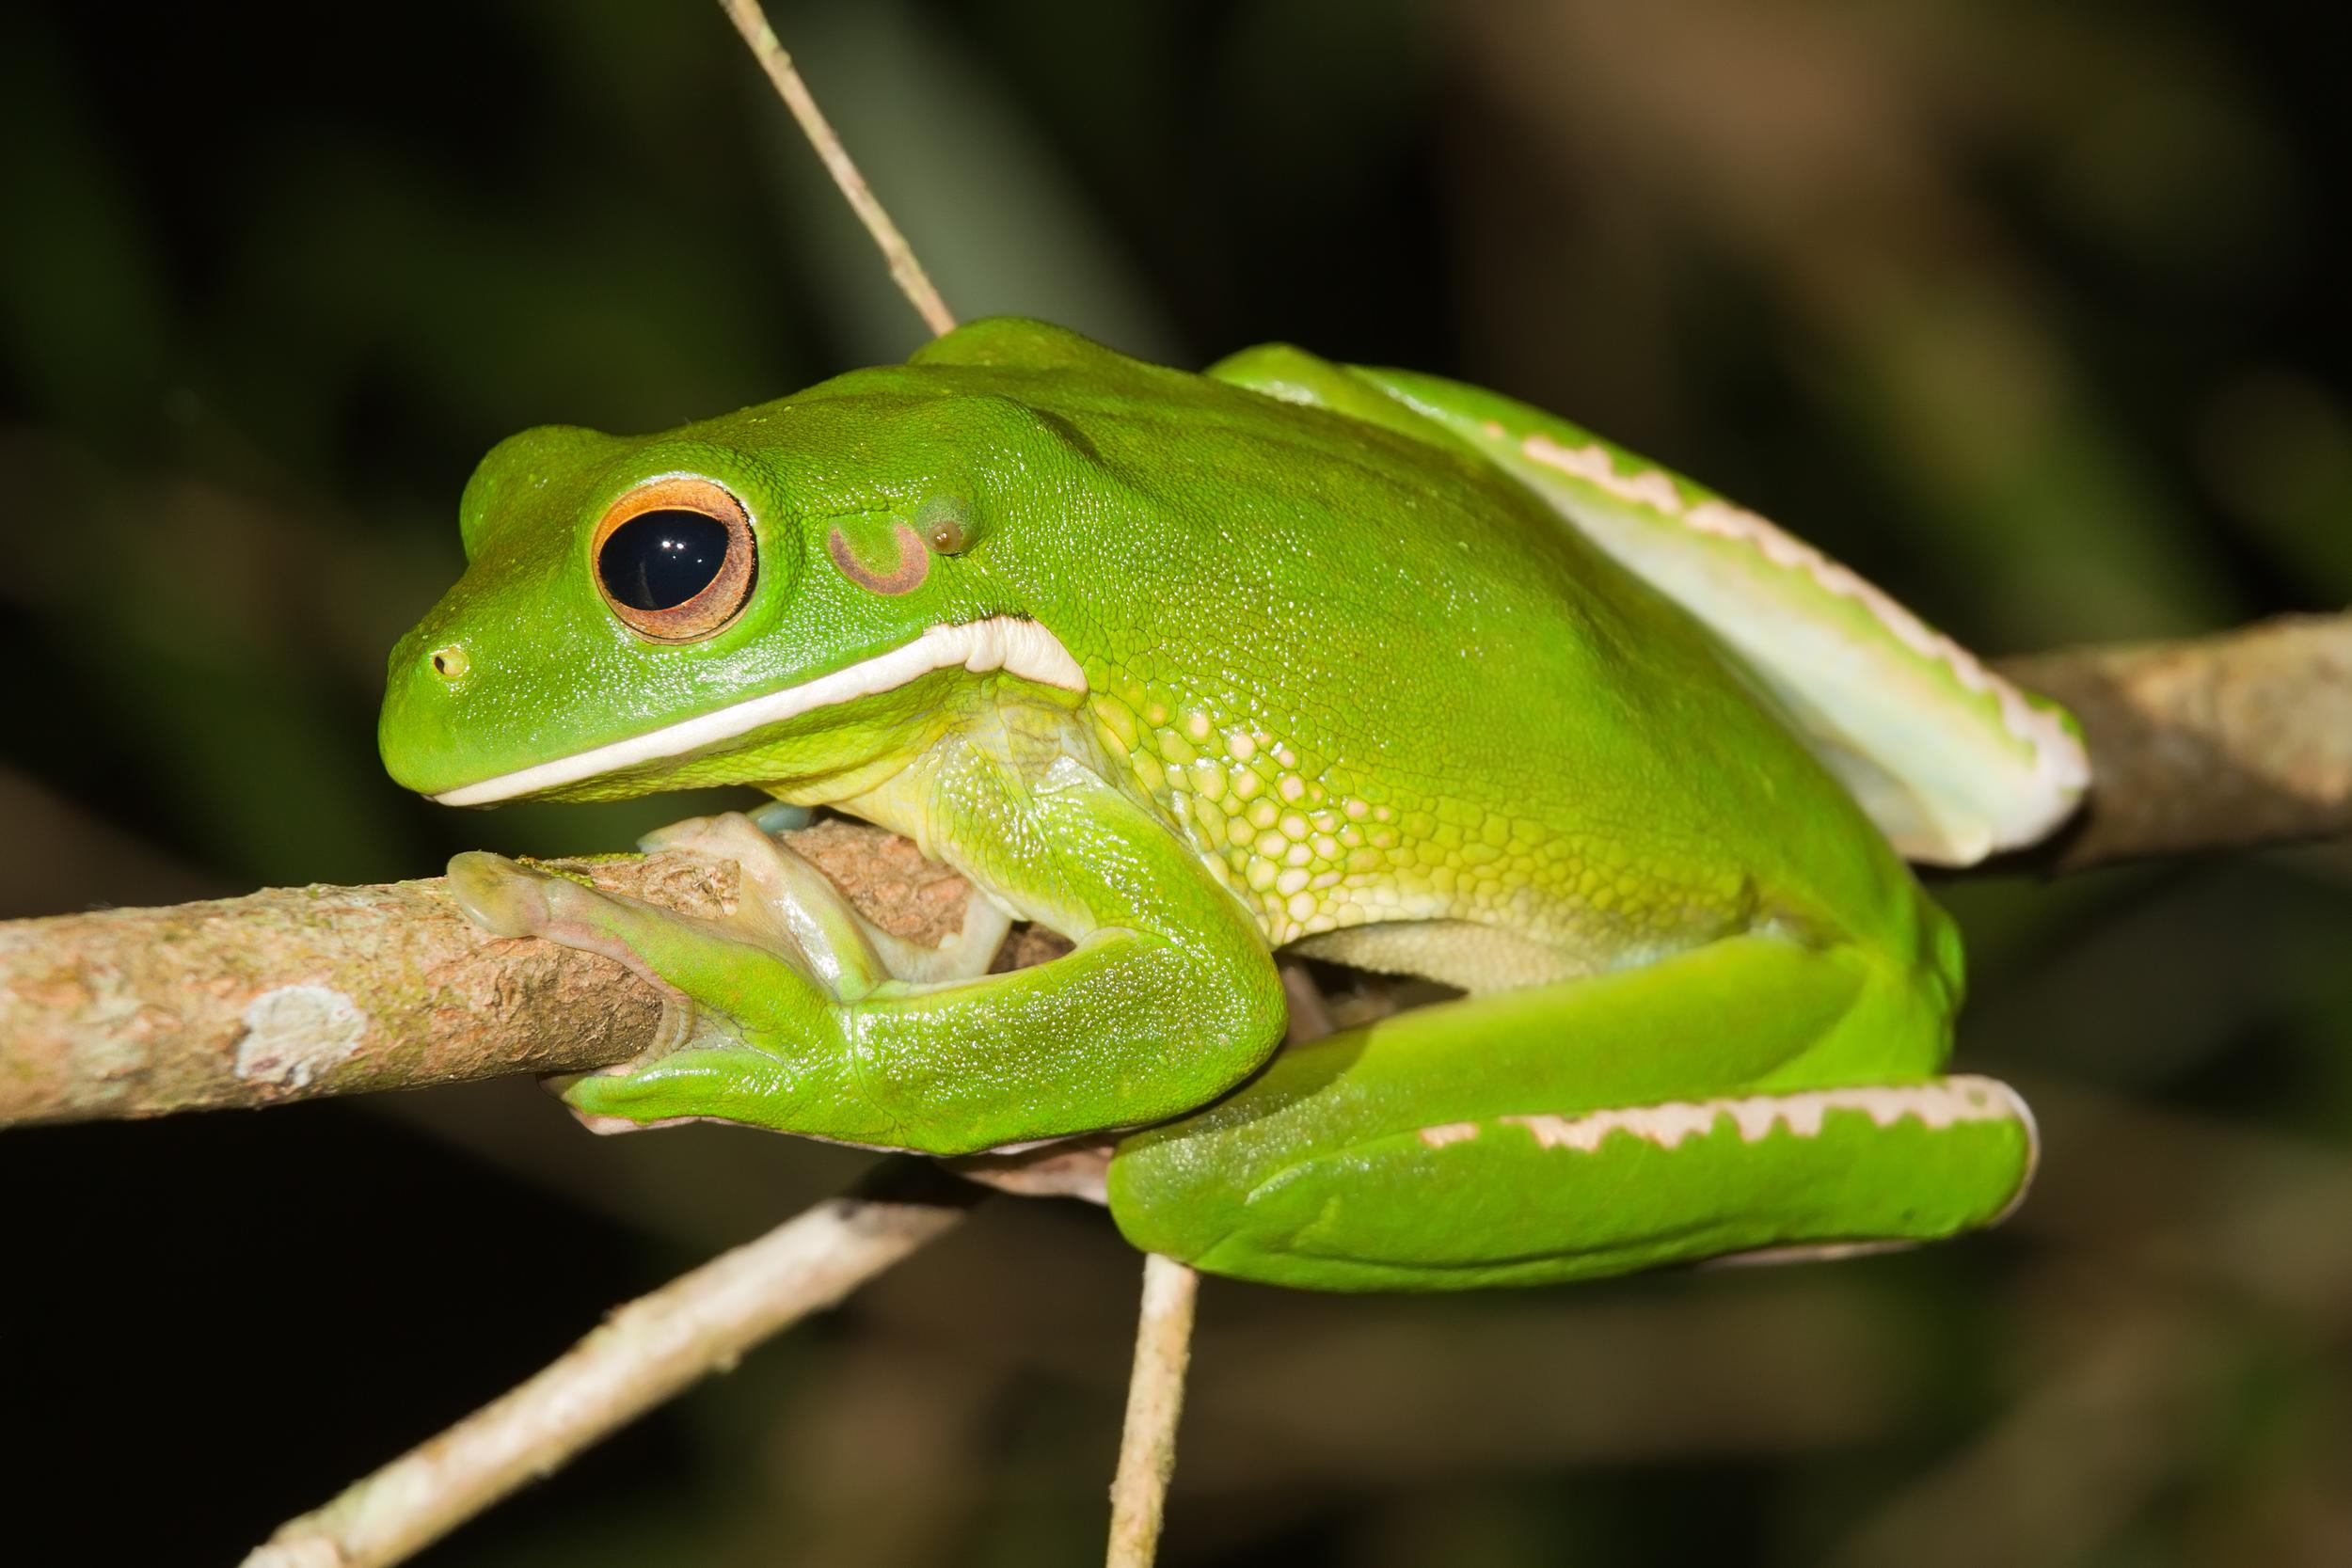 White-lipped tree frog - Wikipedia